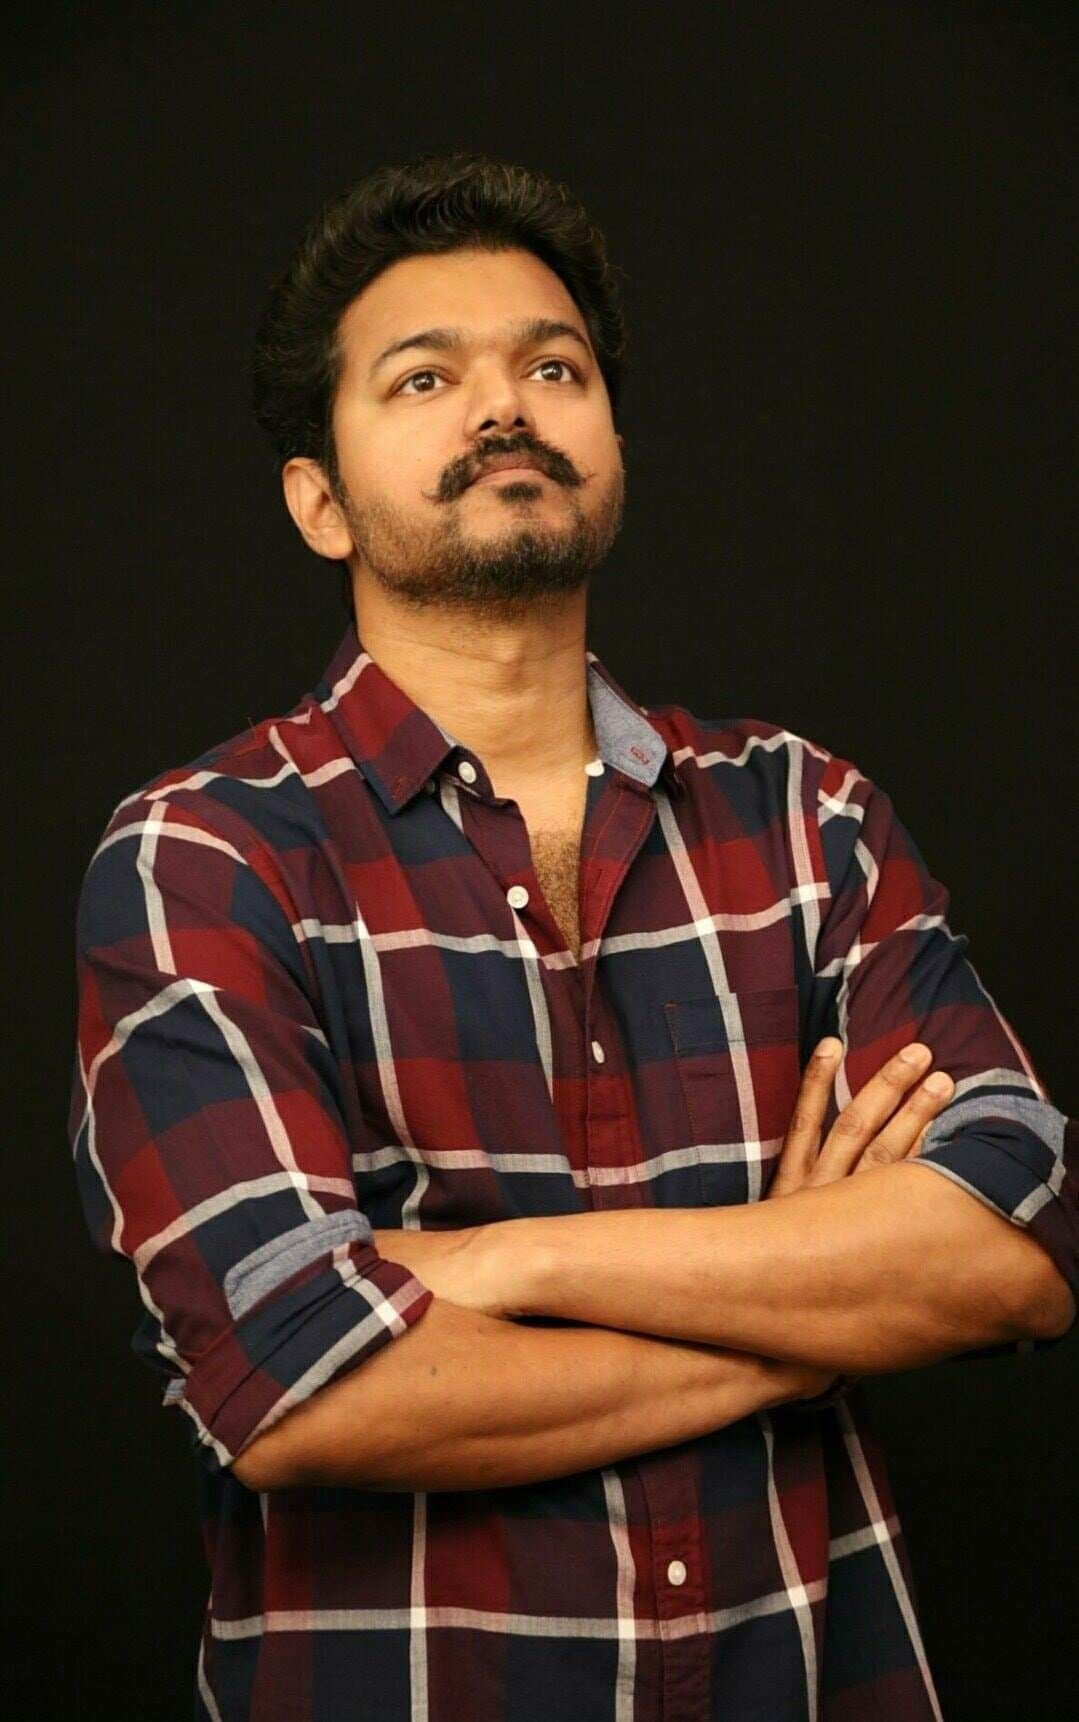 Pin By Vigneshapj On Vijay Actor Vijay Actor Actor Photo